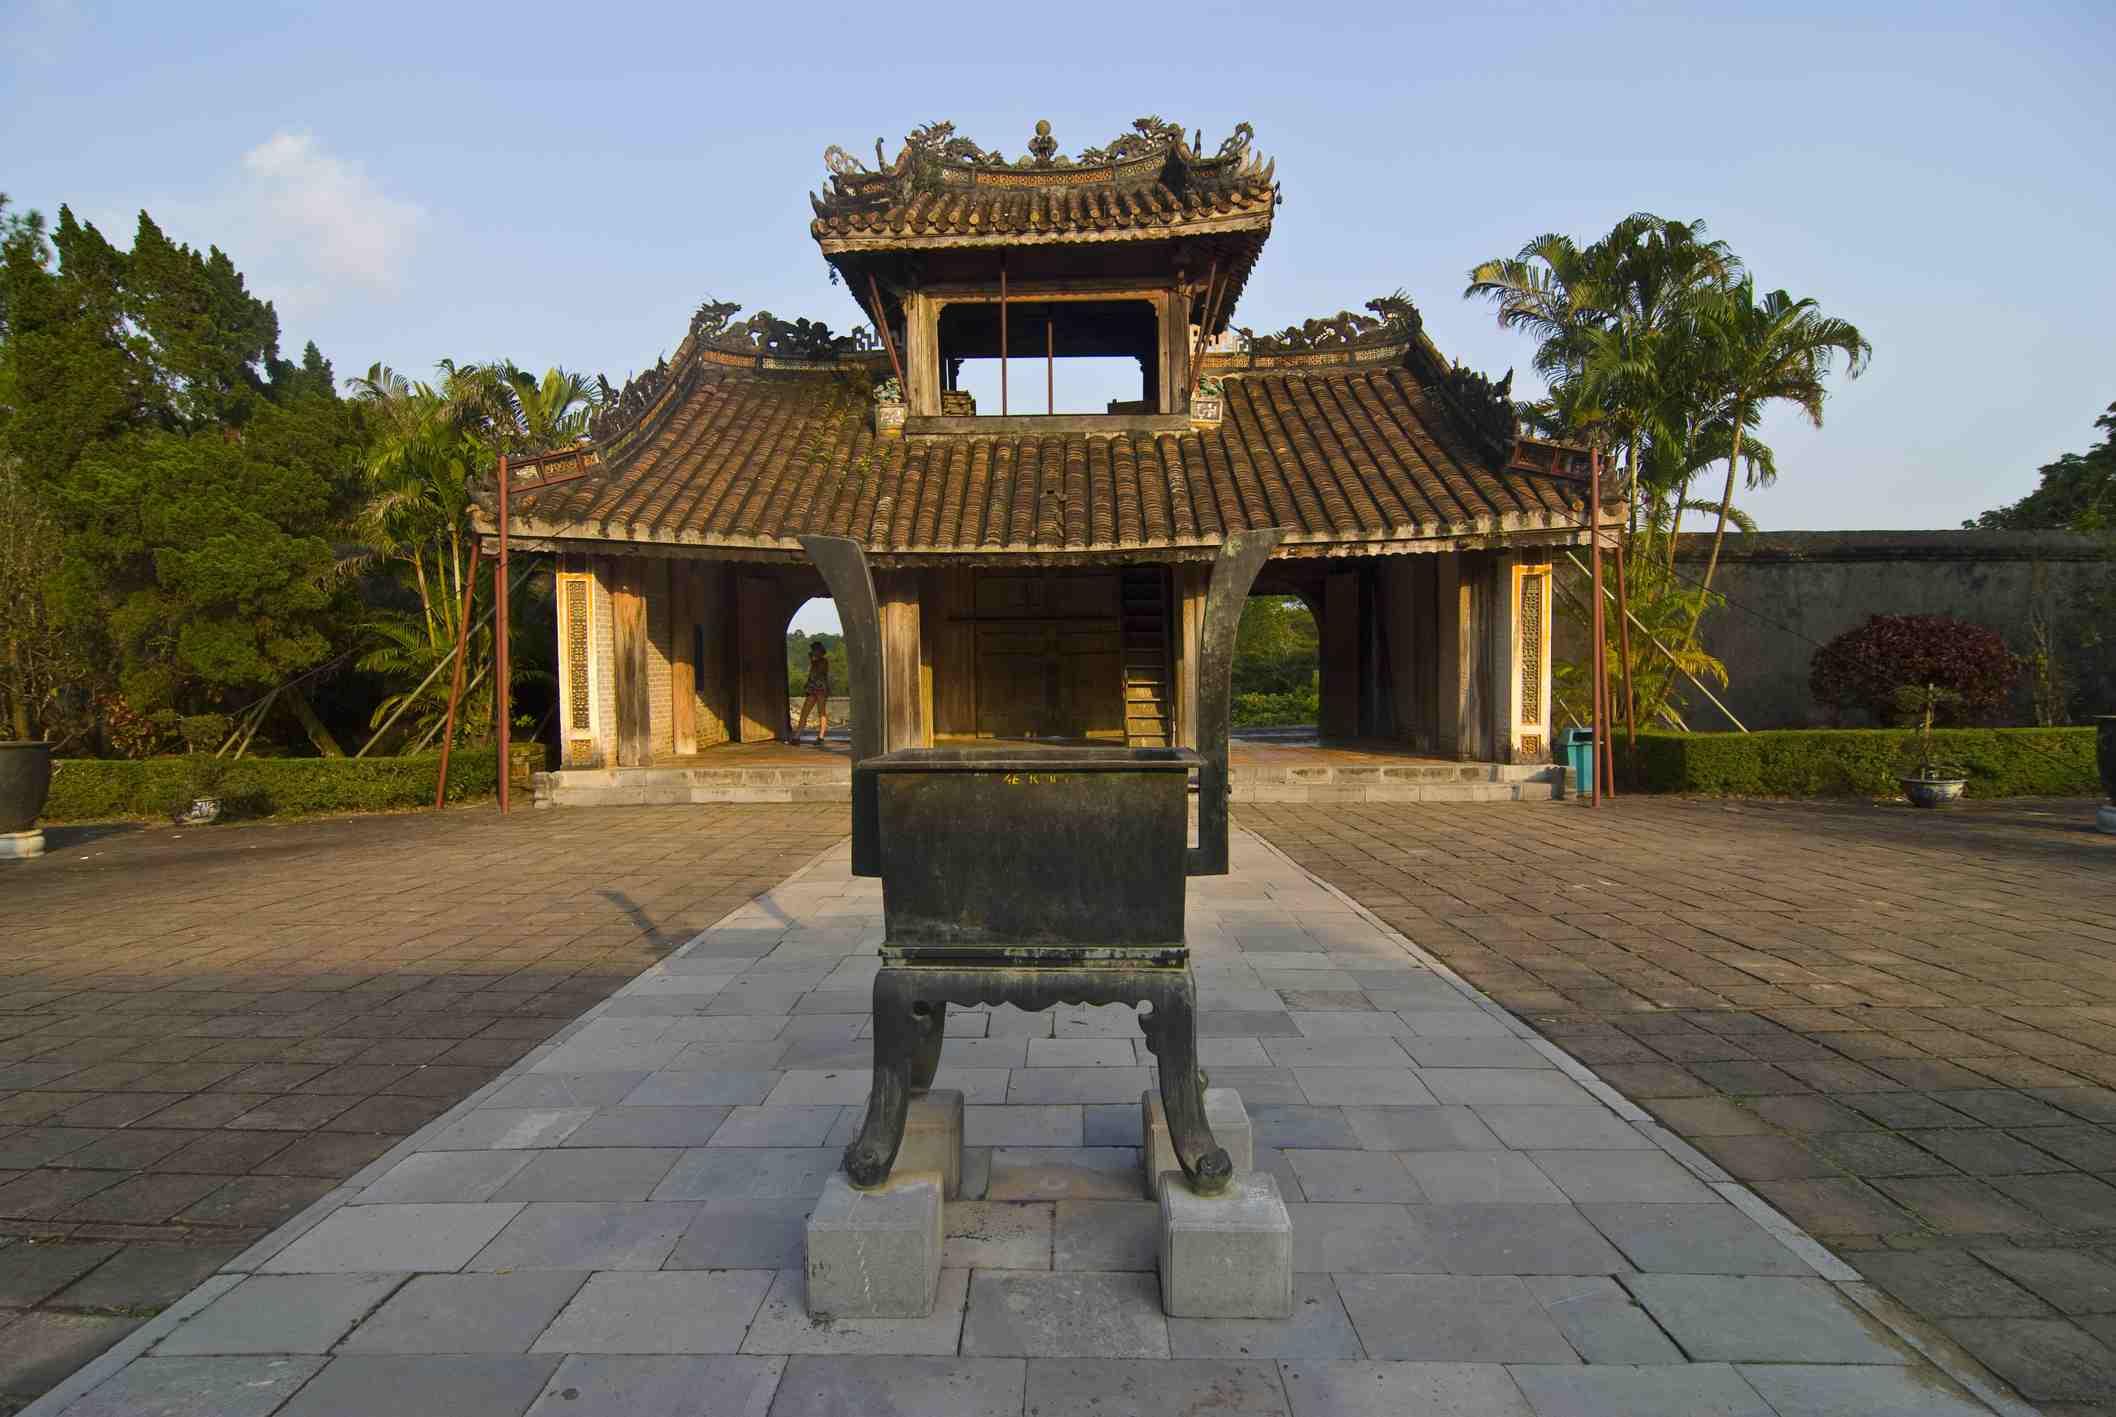 Hoa Khiem Palace and Courtyard, Tu Duc Royal Tomb, Hue, Vietnam